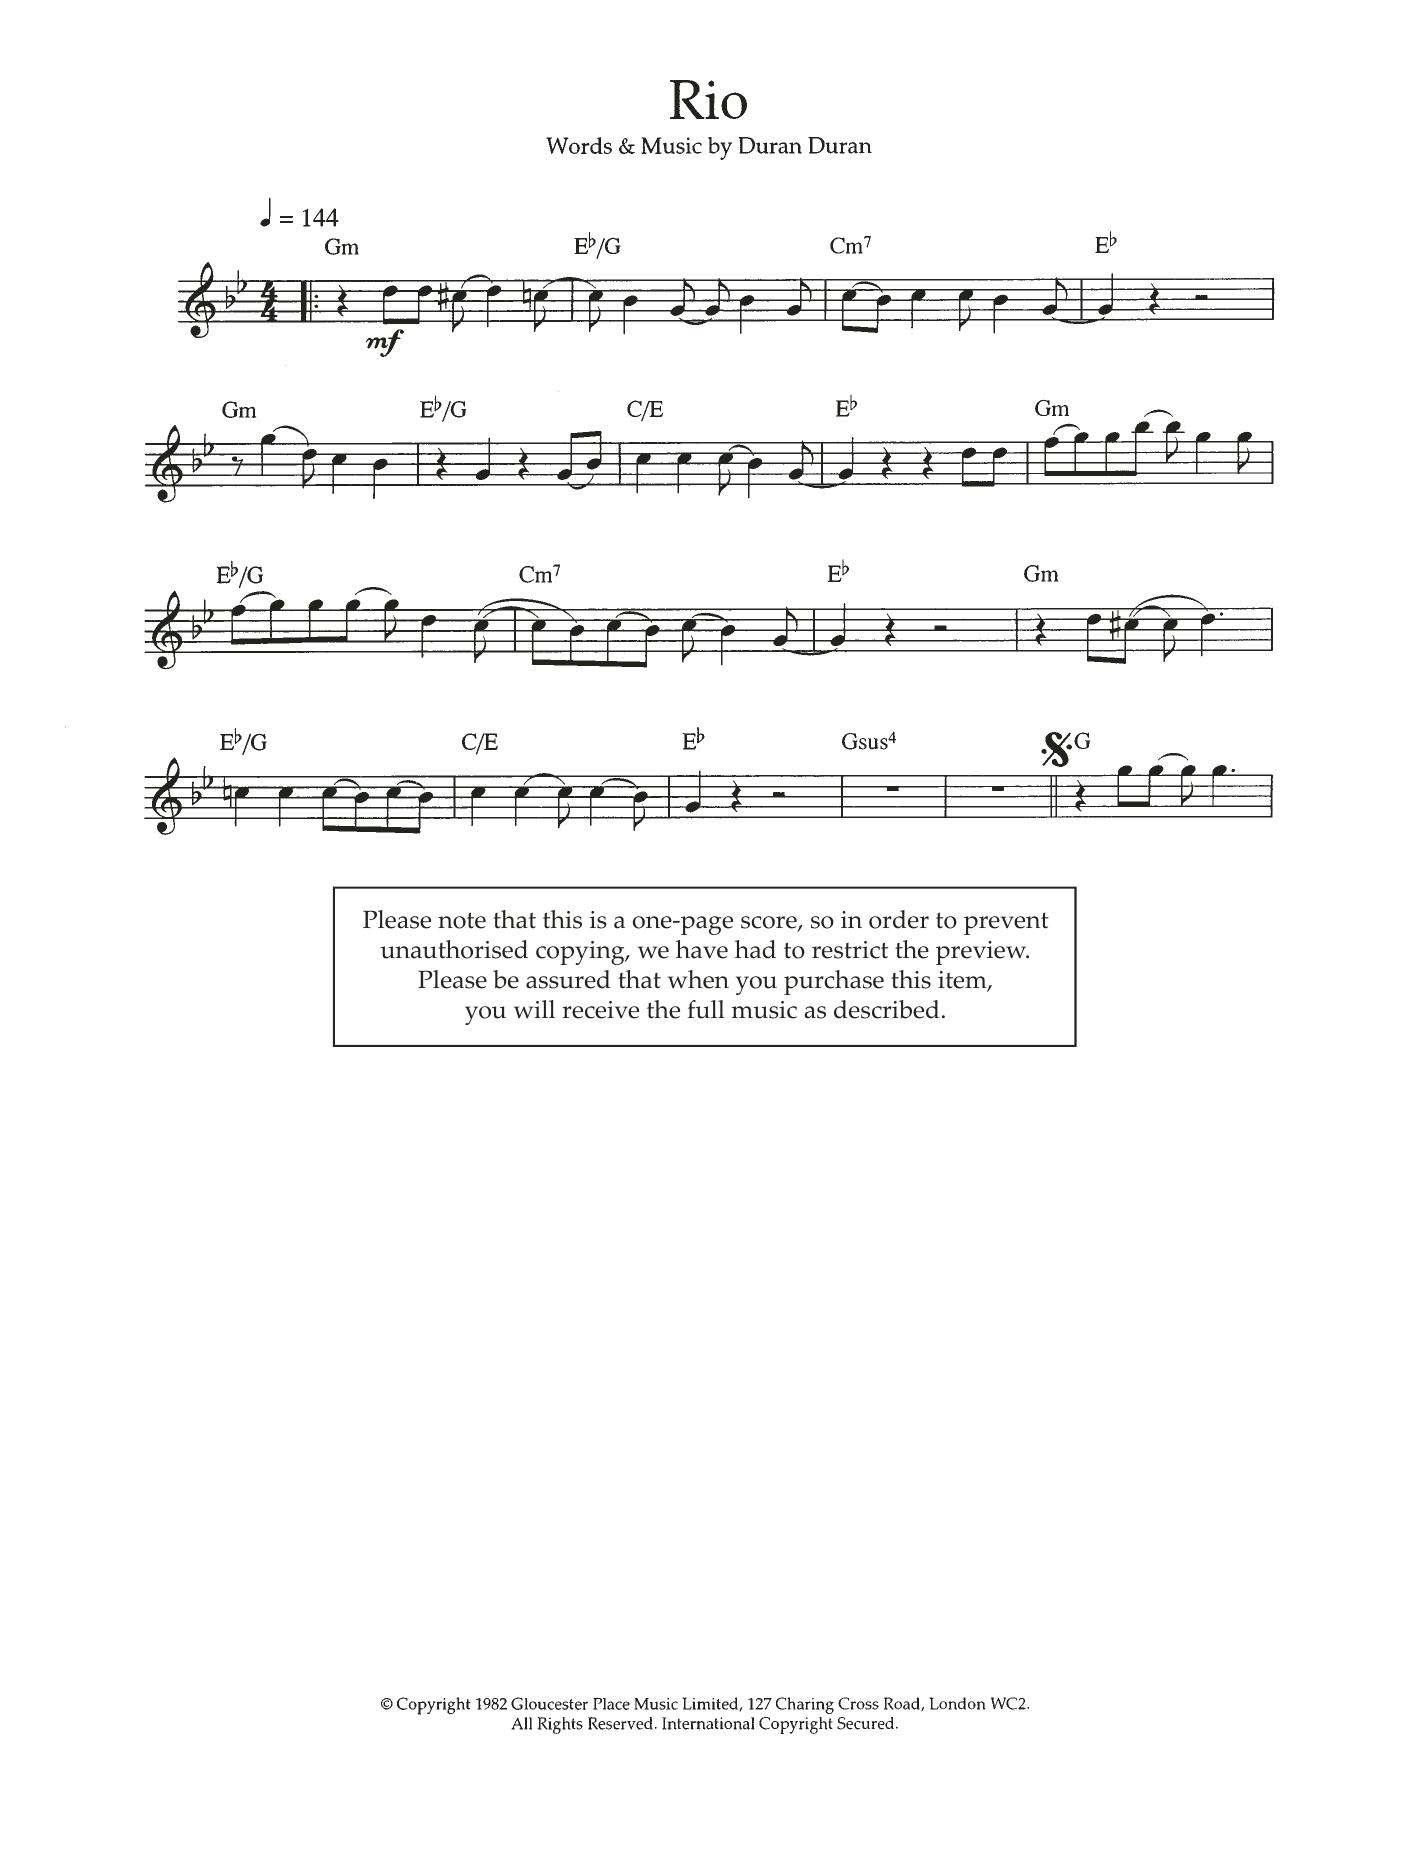 Rio Sheet Music